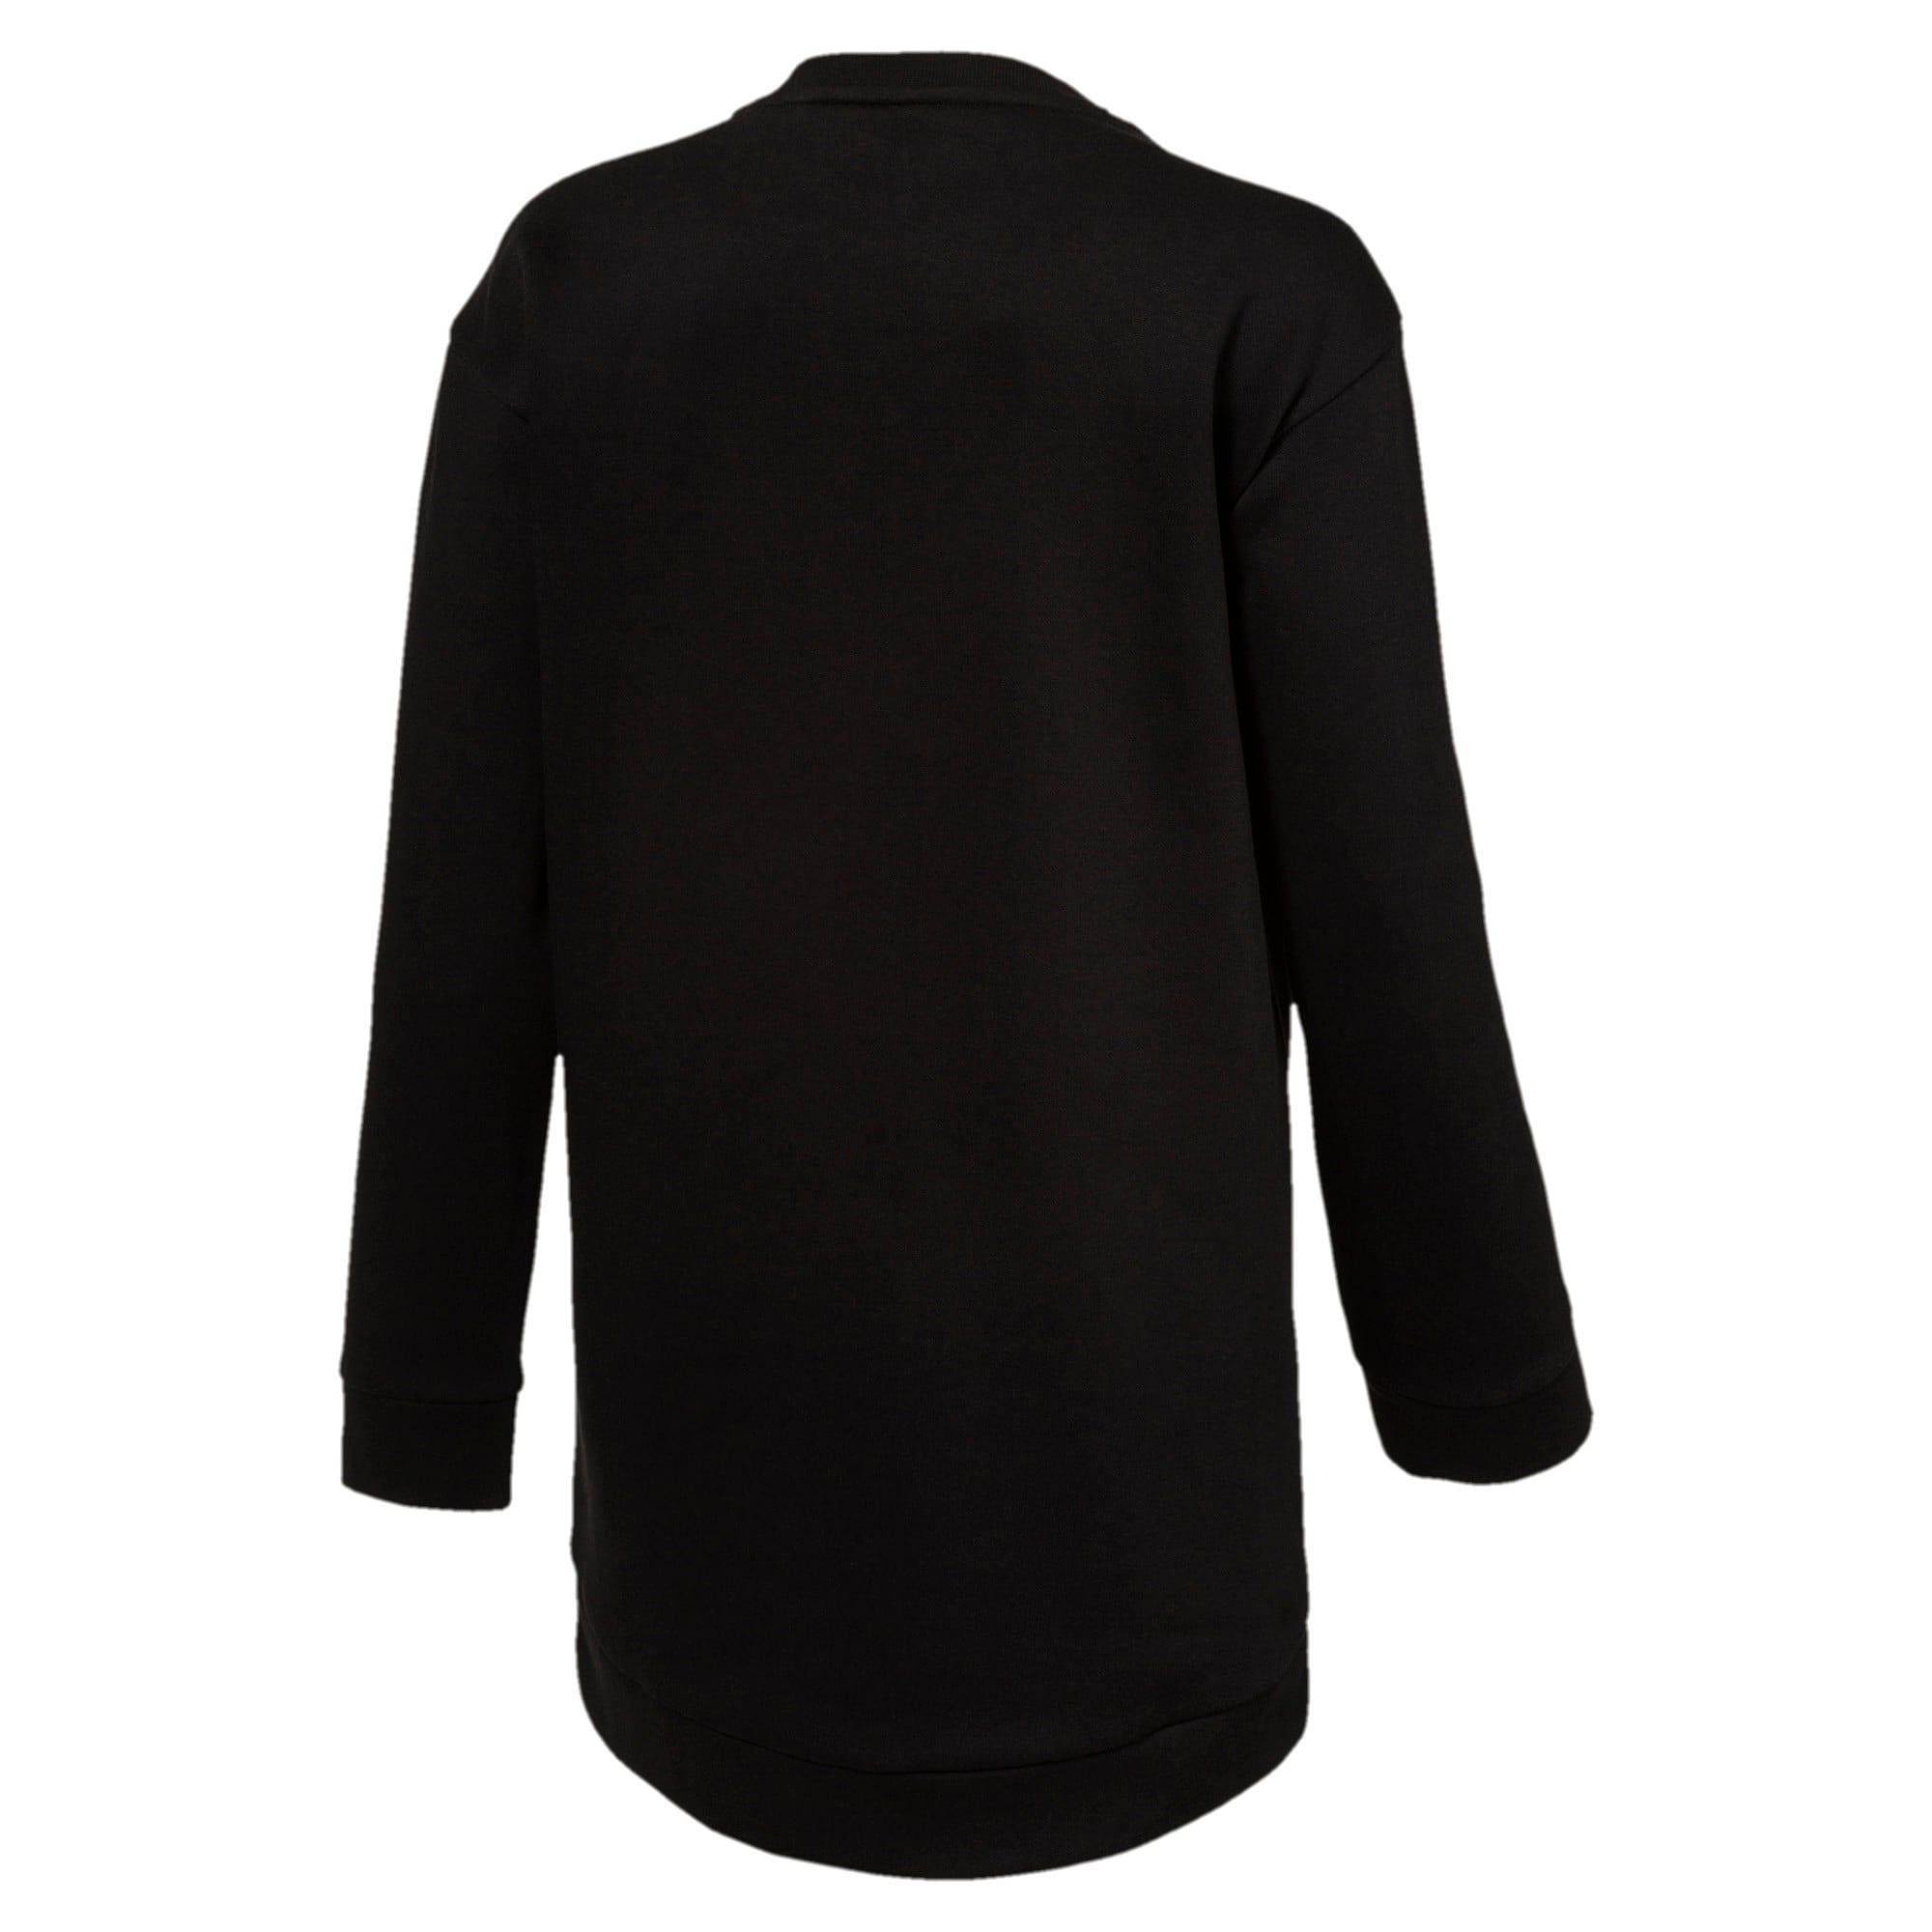 Thumbnail 2 of Style Girls' Long Crew Sweater JR, Cotton Black, medium